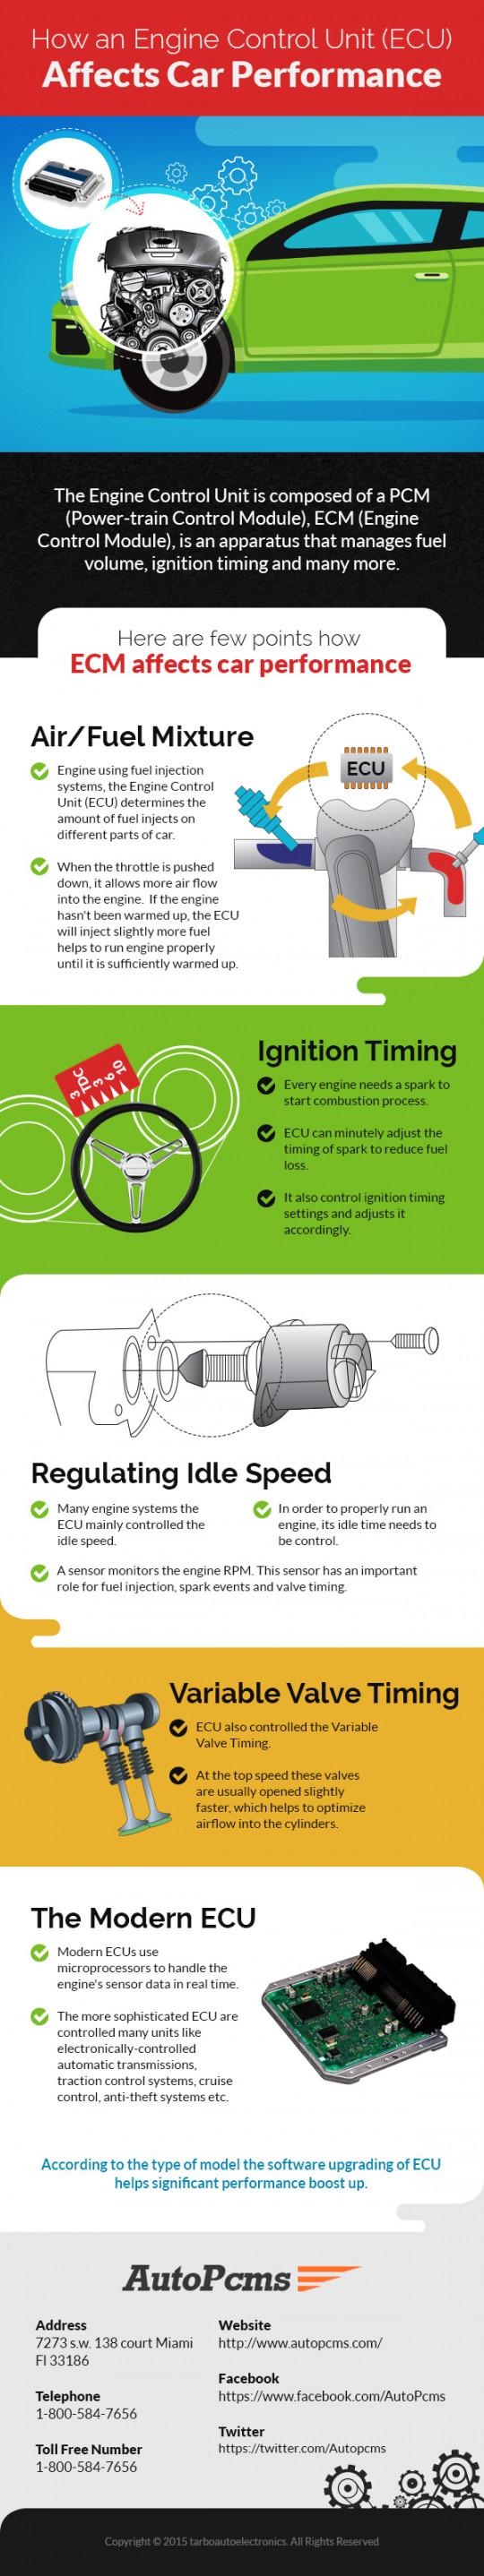 How an Engine Control Unit (ECU) Affects Car Performance